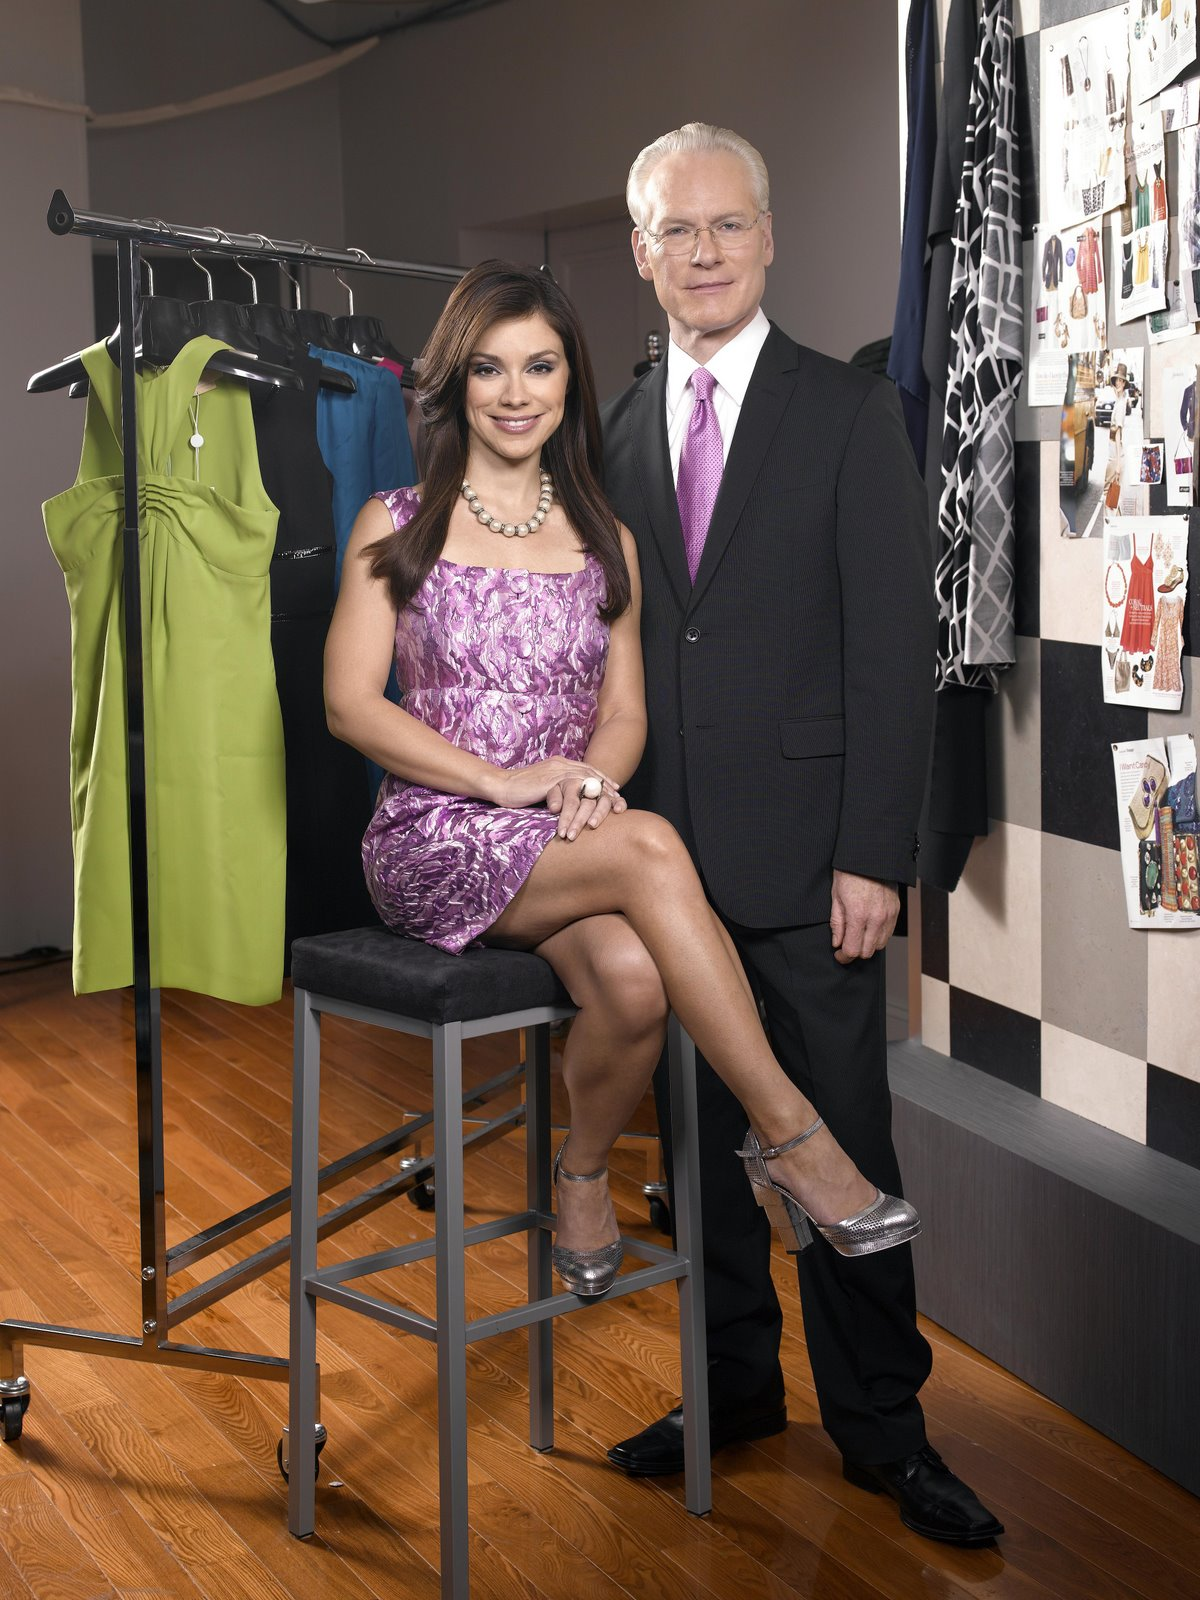 Tim Gunn, and Season 2 co-hosted by model Gretta Monahan